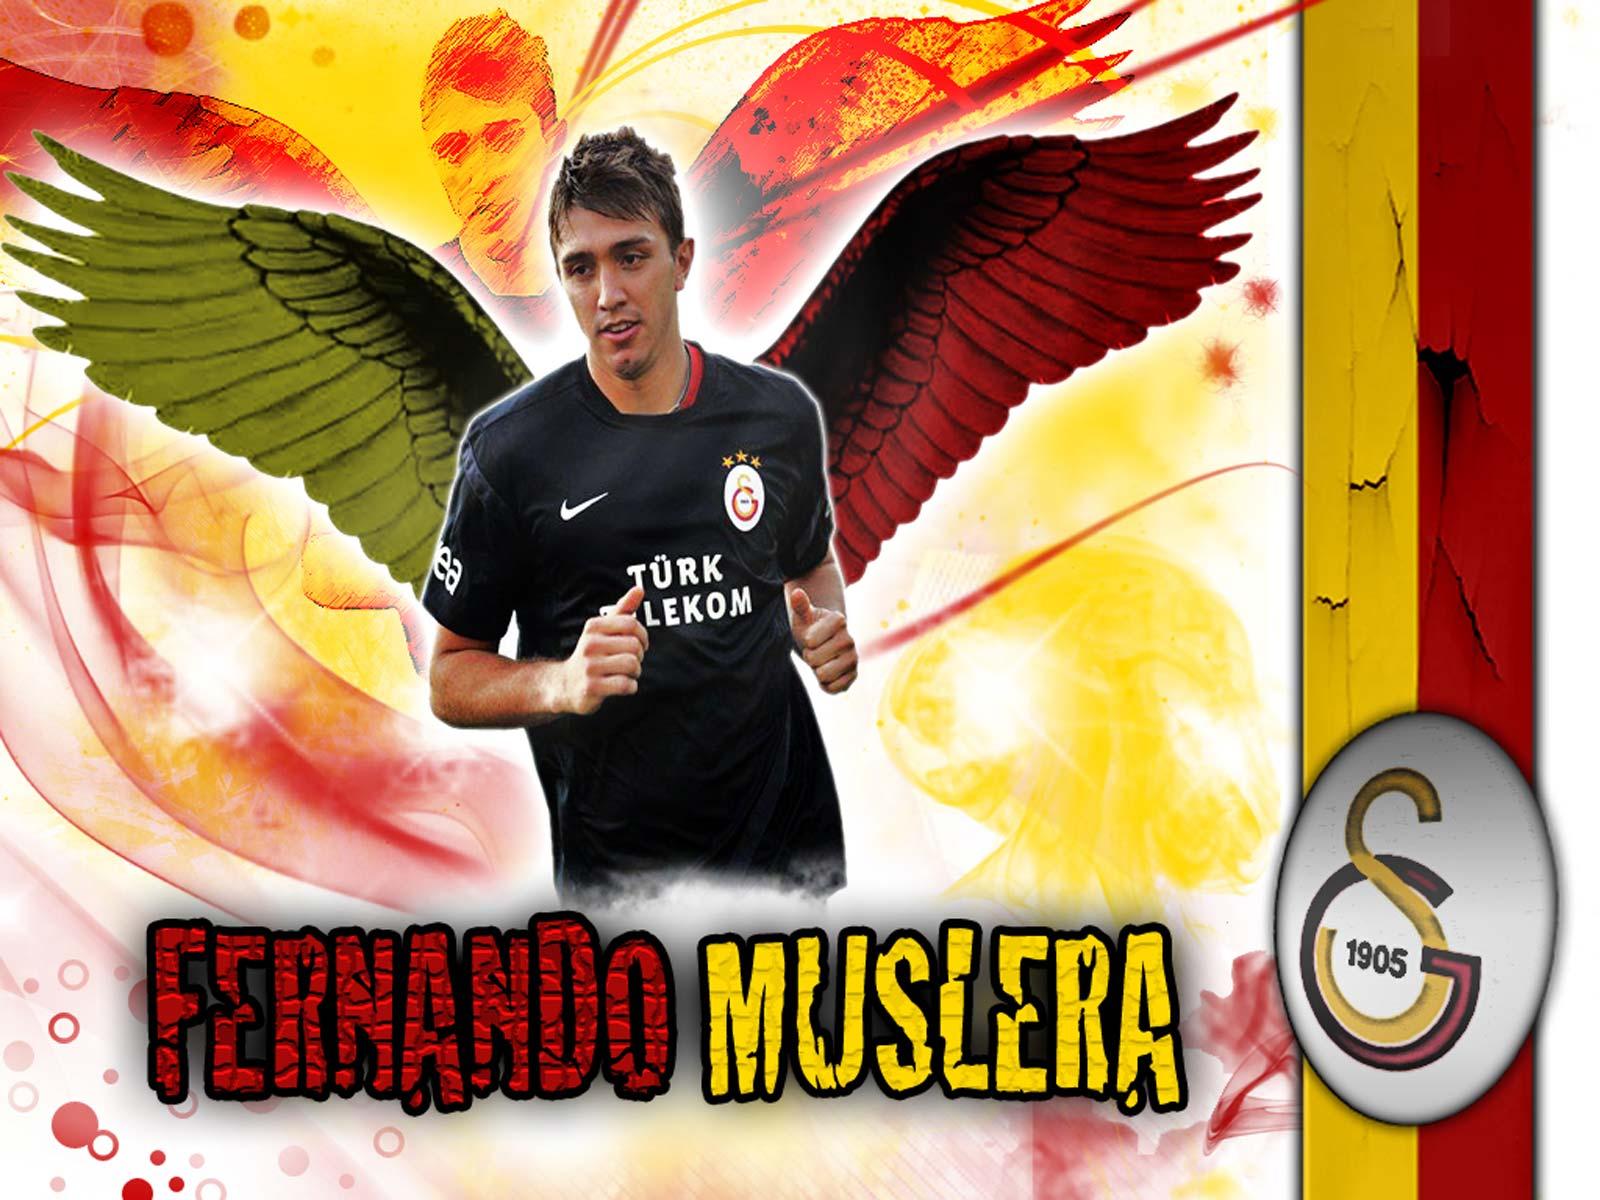 Fernando Muslera Wallpapers | Football Wallpapers Football Players ...